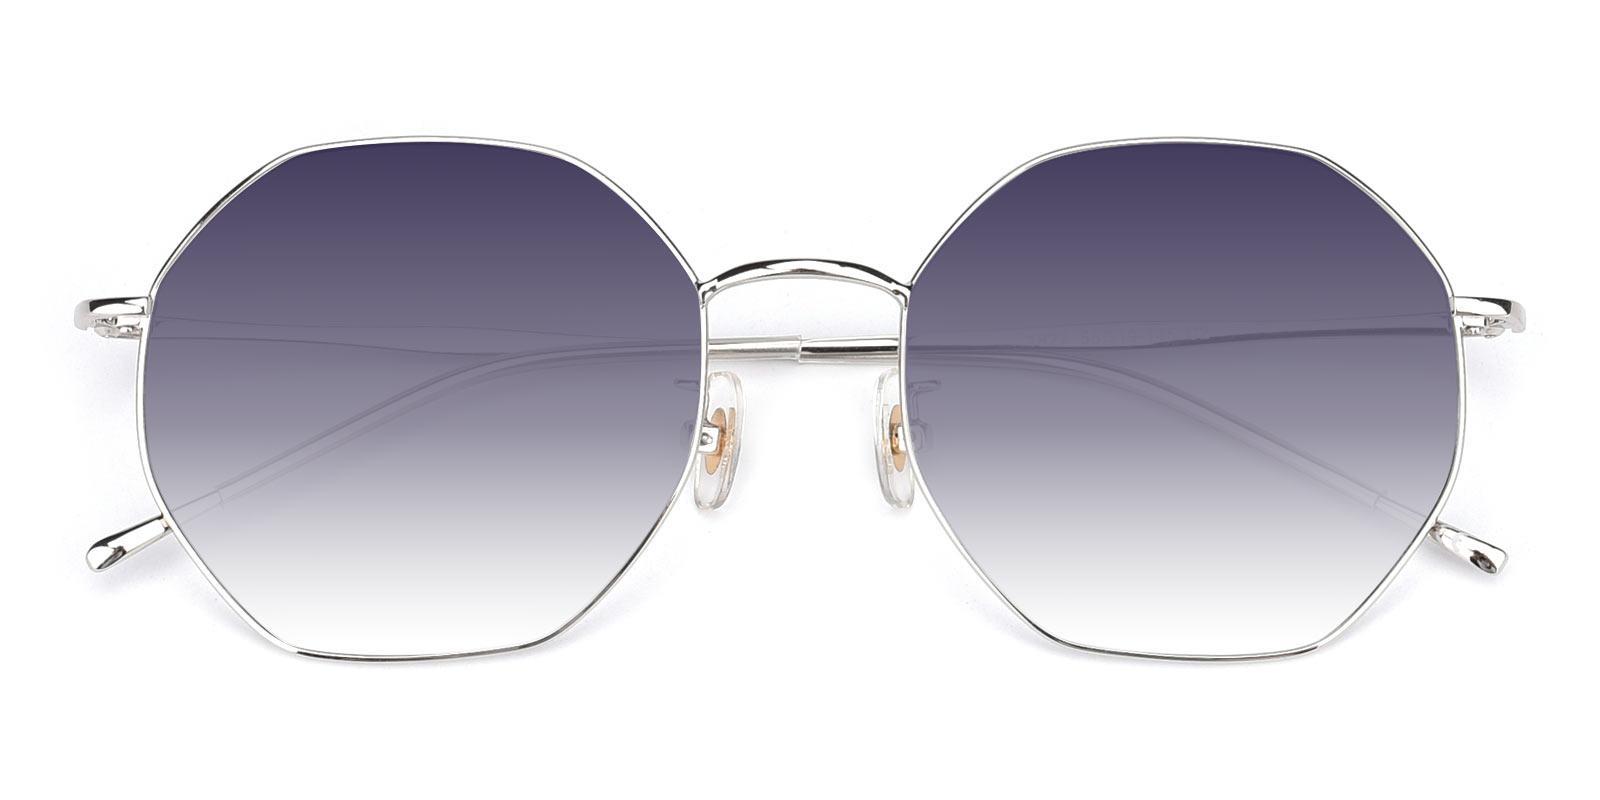 Pleasure-Silver-Geometric-Metal-Sunglasses-detail